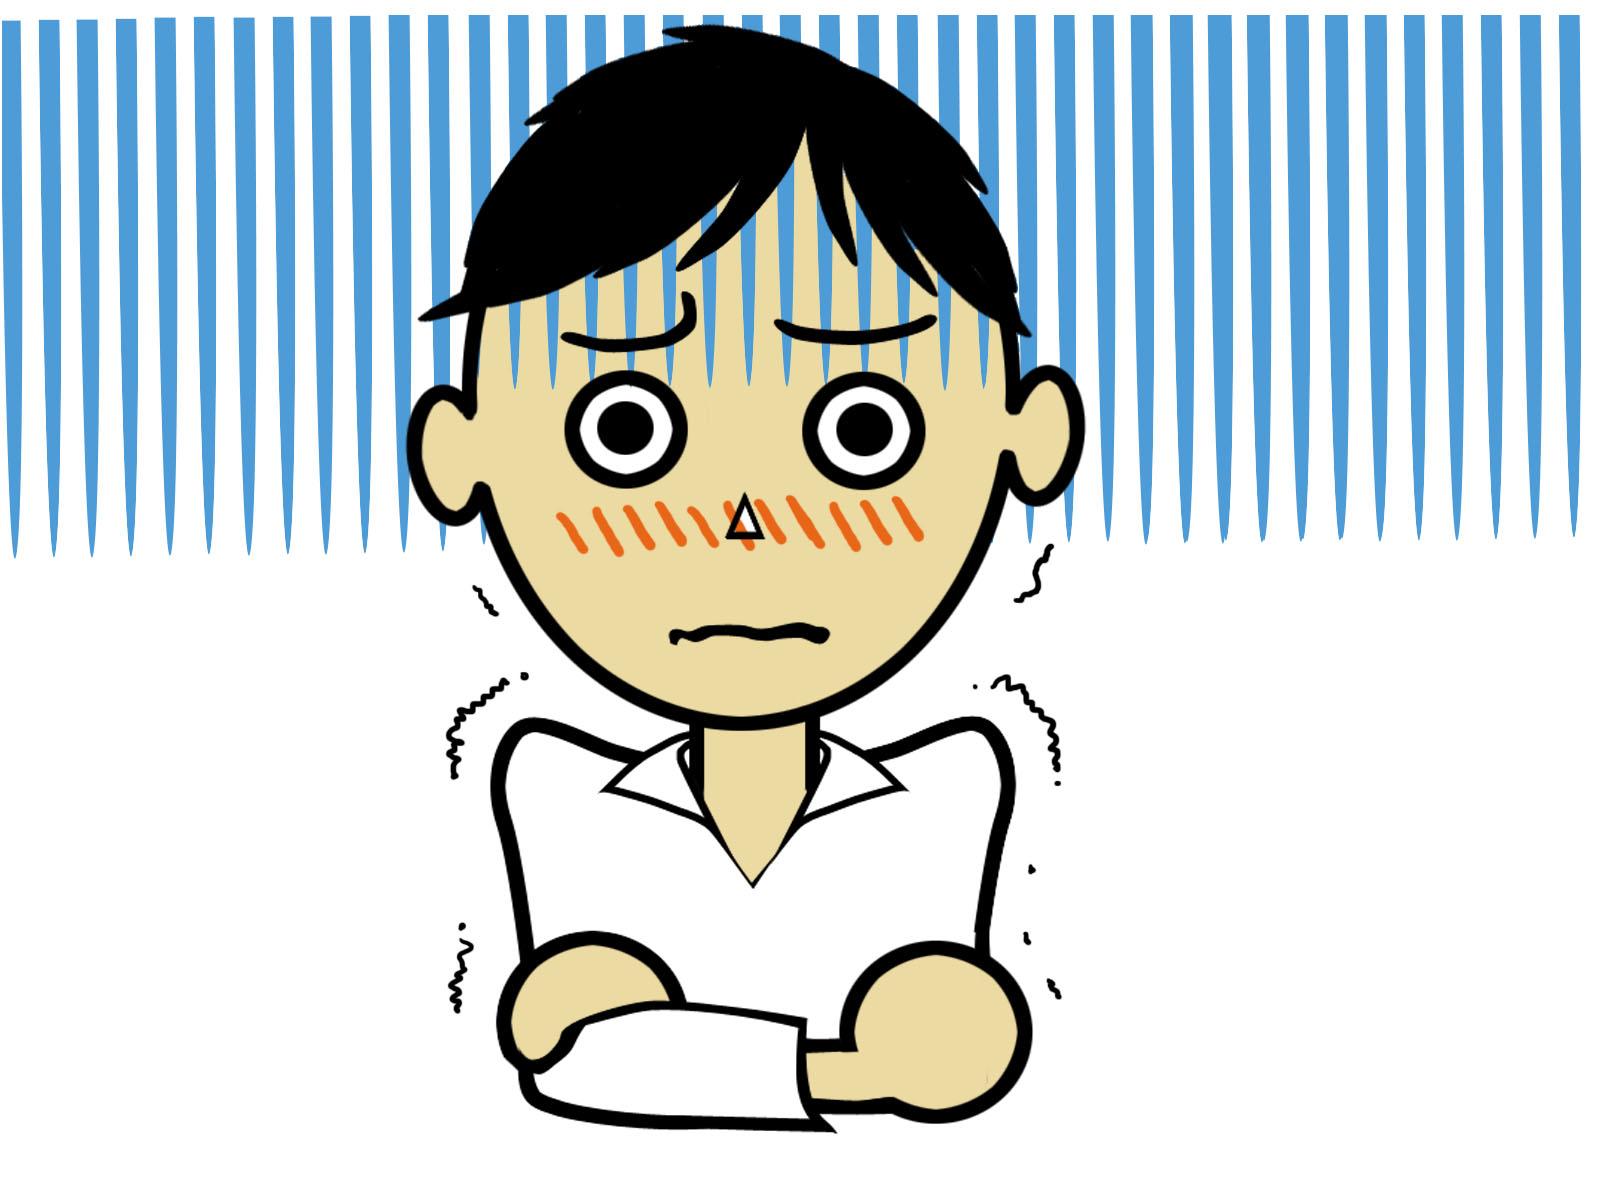 【Japanese Onomatopoeia】ZOKU-ZOKU / ぞくぞく / ゾクゾク